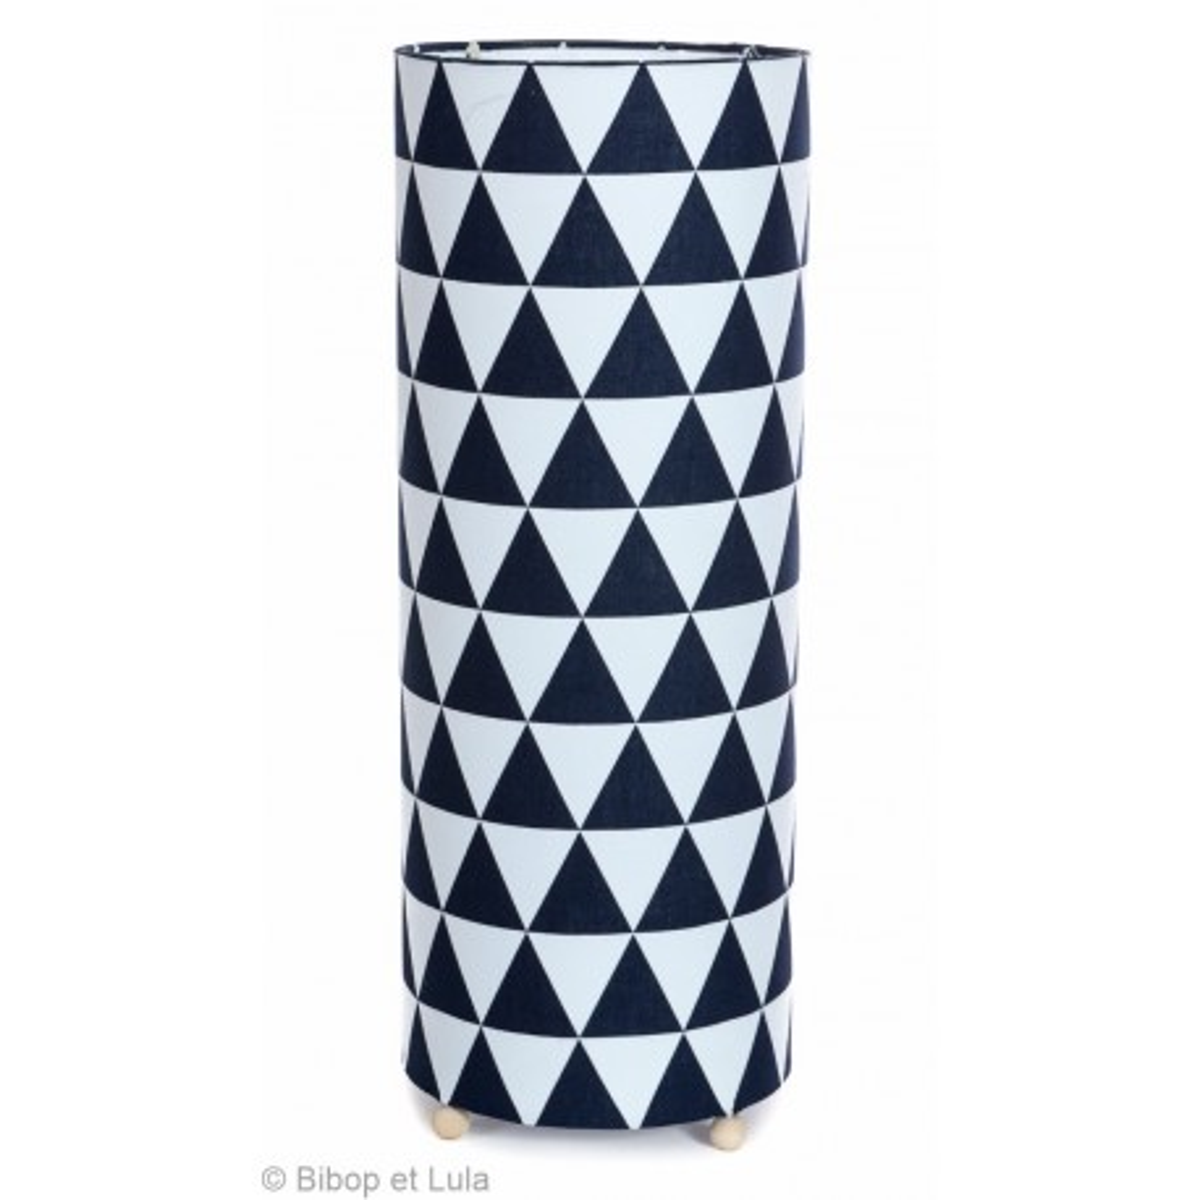 lampe tube à poser tissu noir et blanc